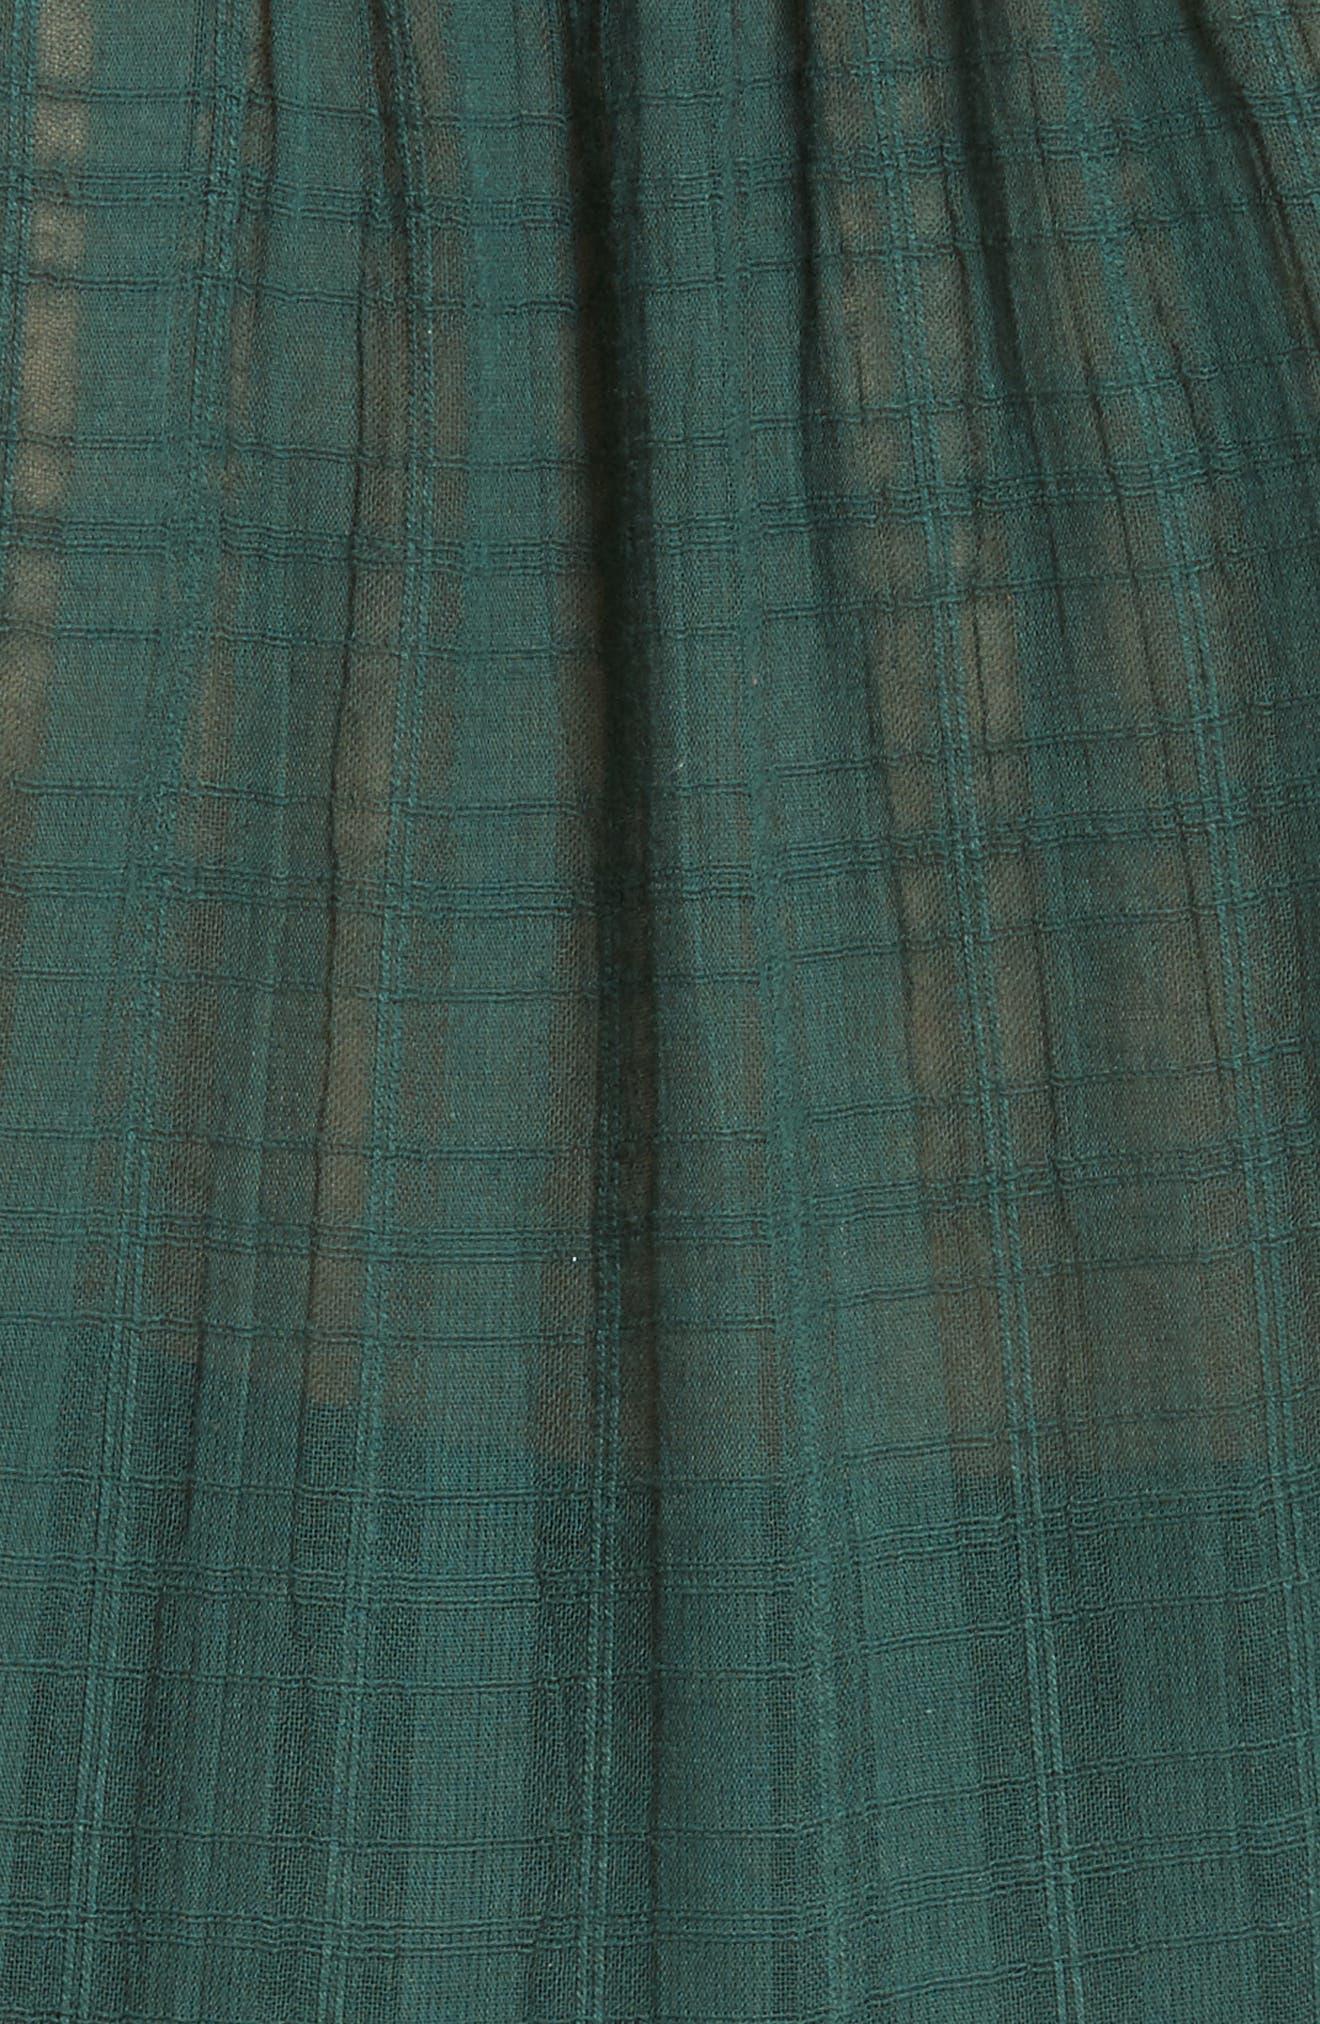 Emerald City Shift Dress,                             Alternate thumbnail 6, color,                             300